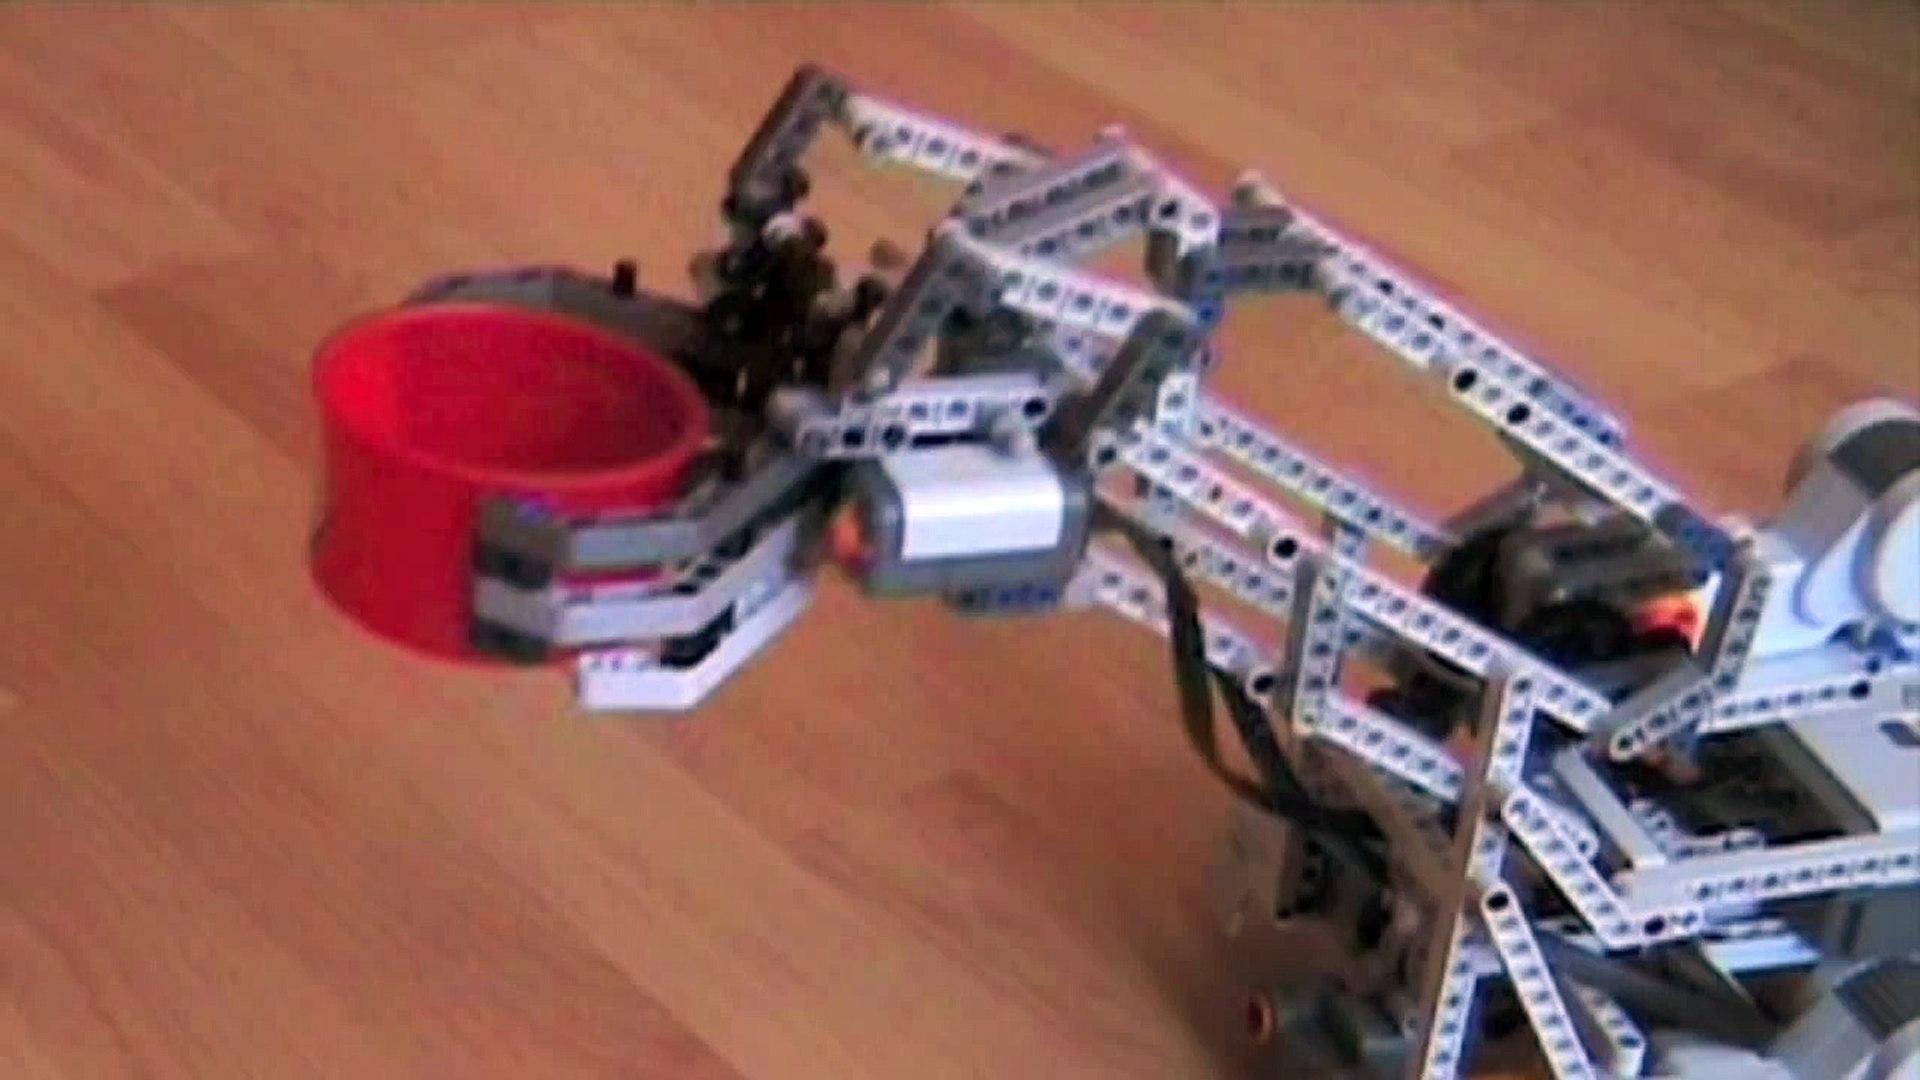 The Snatcher XT - Lego Mindstorms NXT 2 0